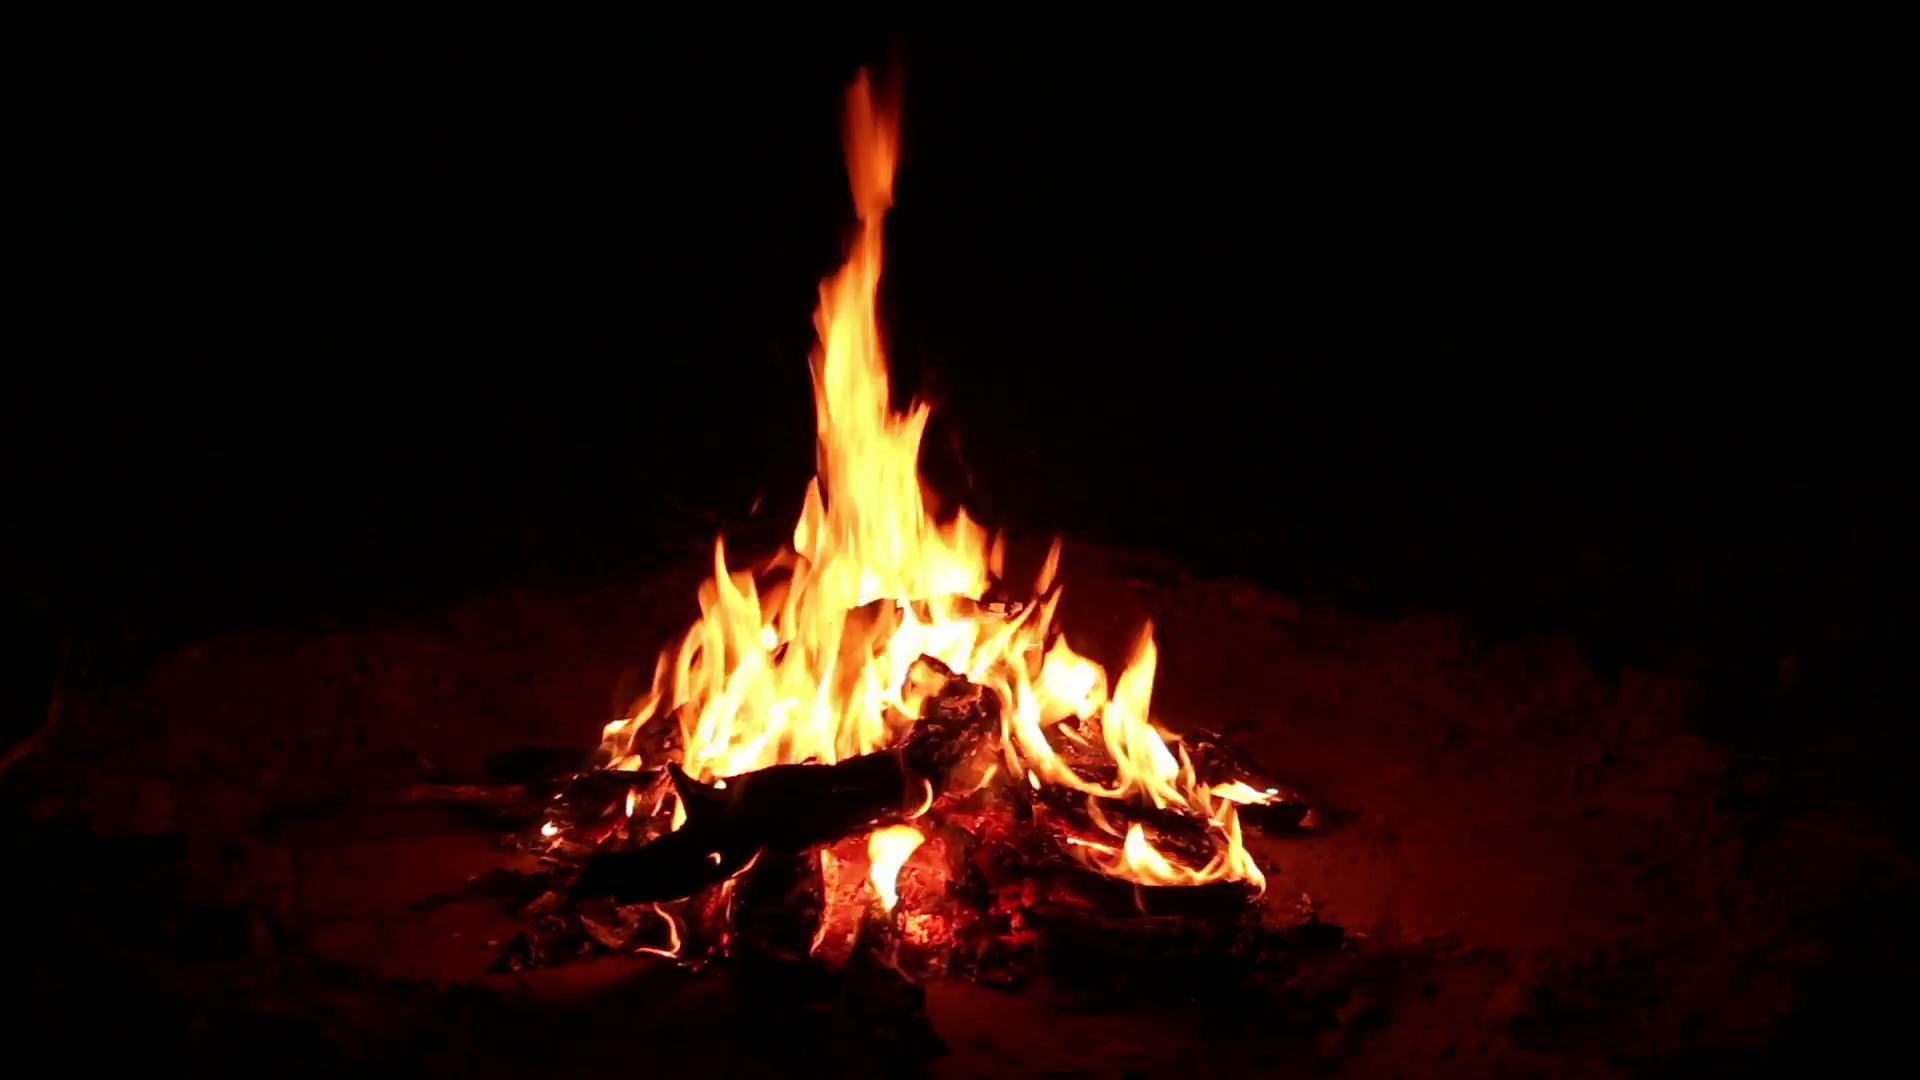 Nighttime campfire Stock Video Footage - Videoblocks